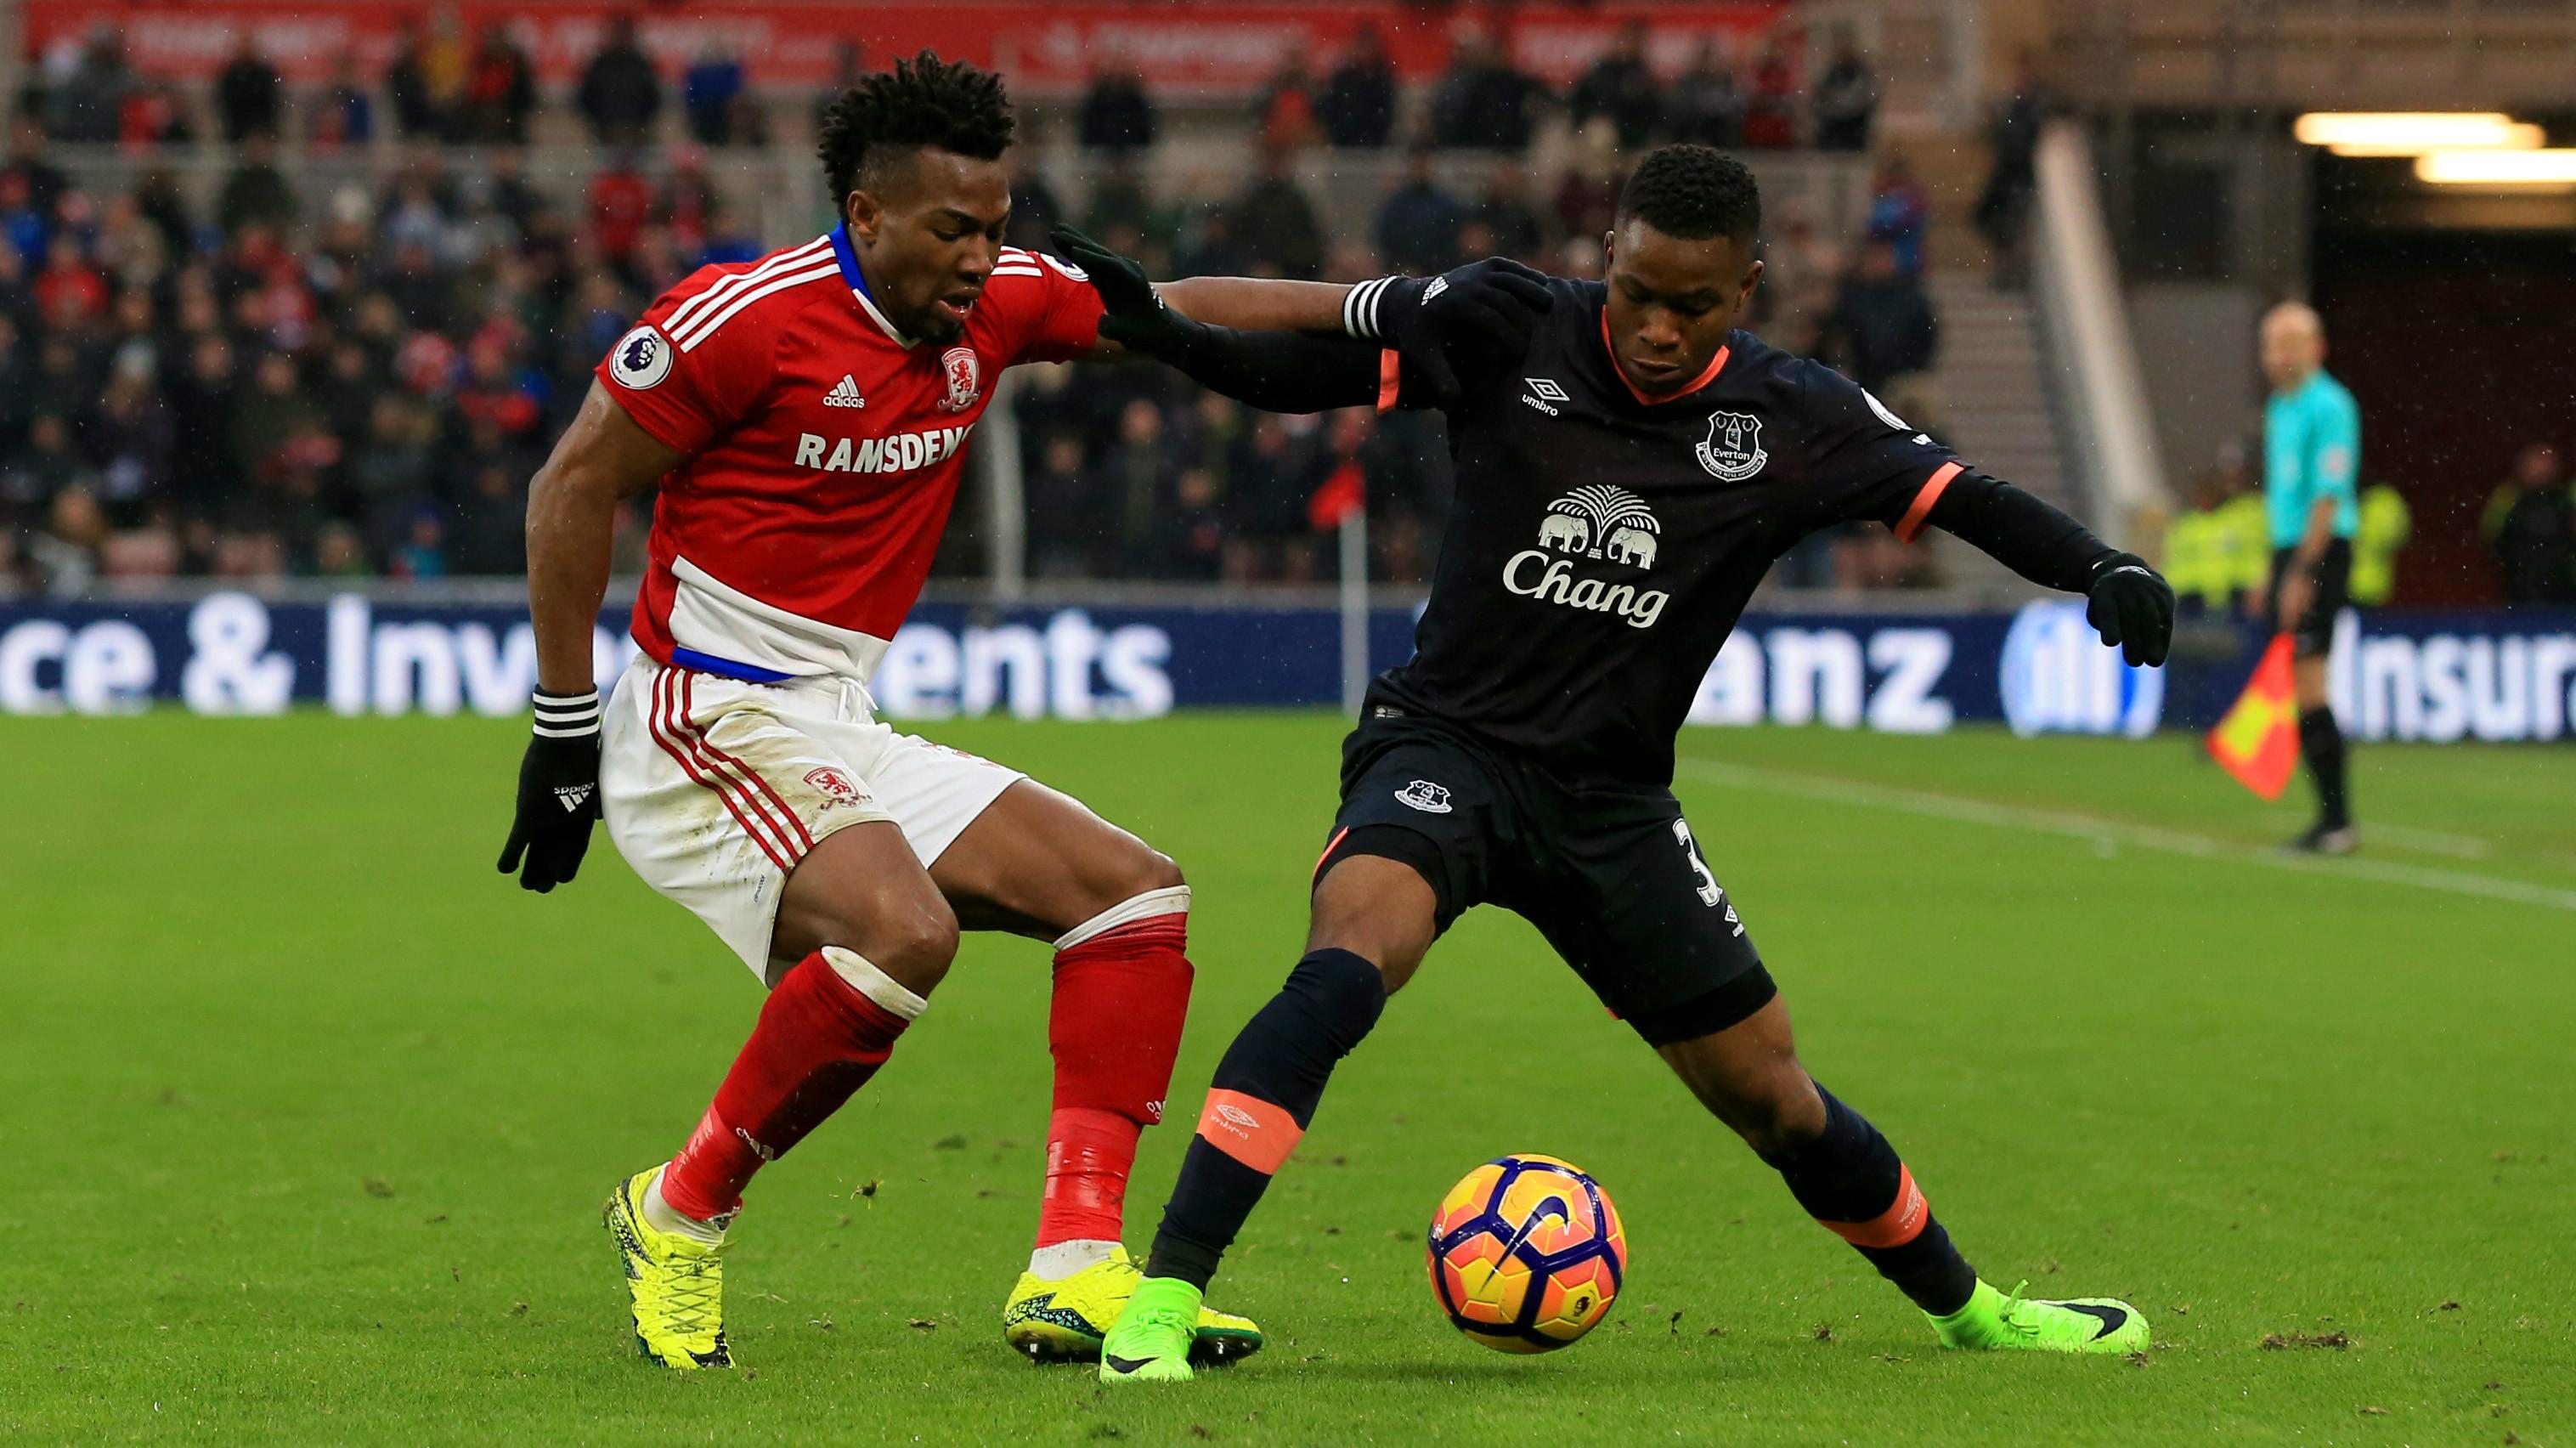 Ademola Lookman Adama Traore Middlesbrough Everton Premier League 11022017